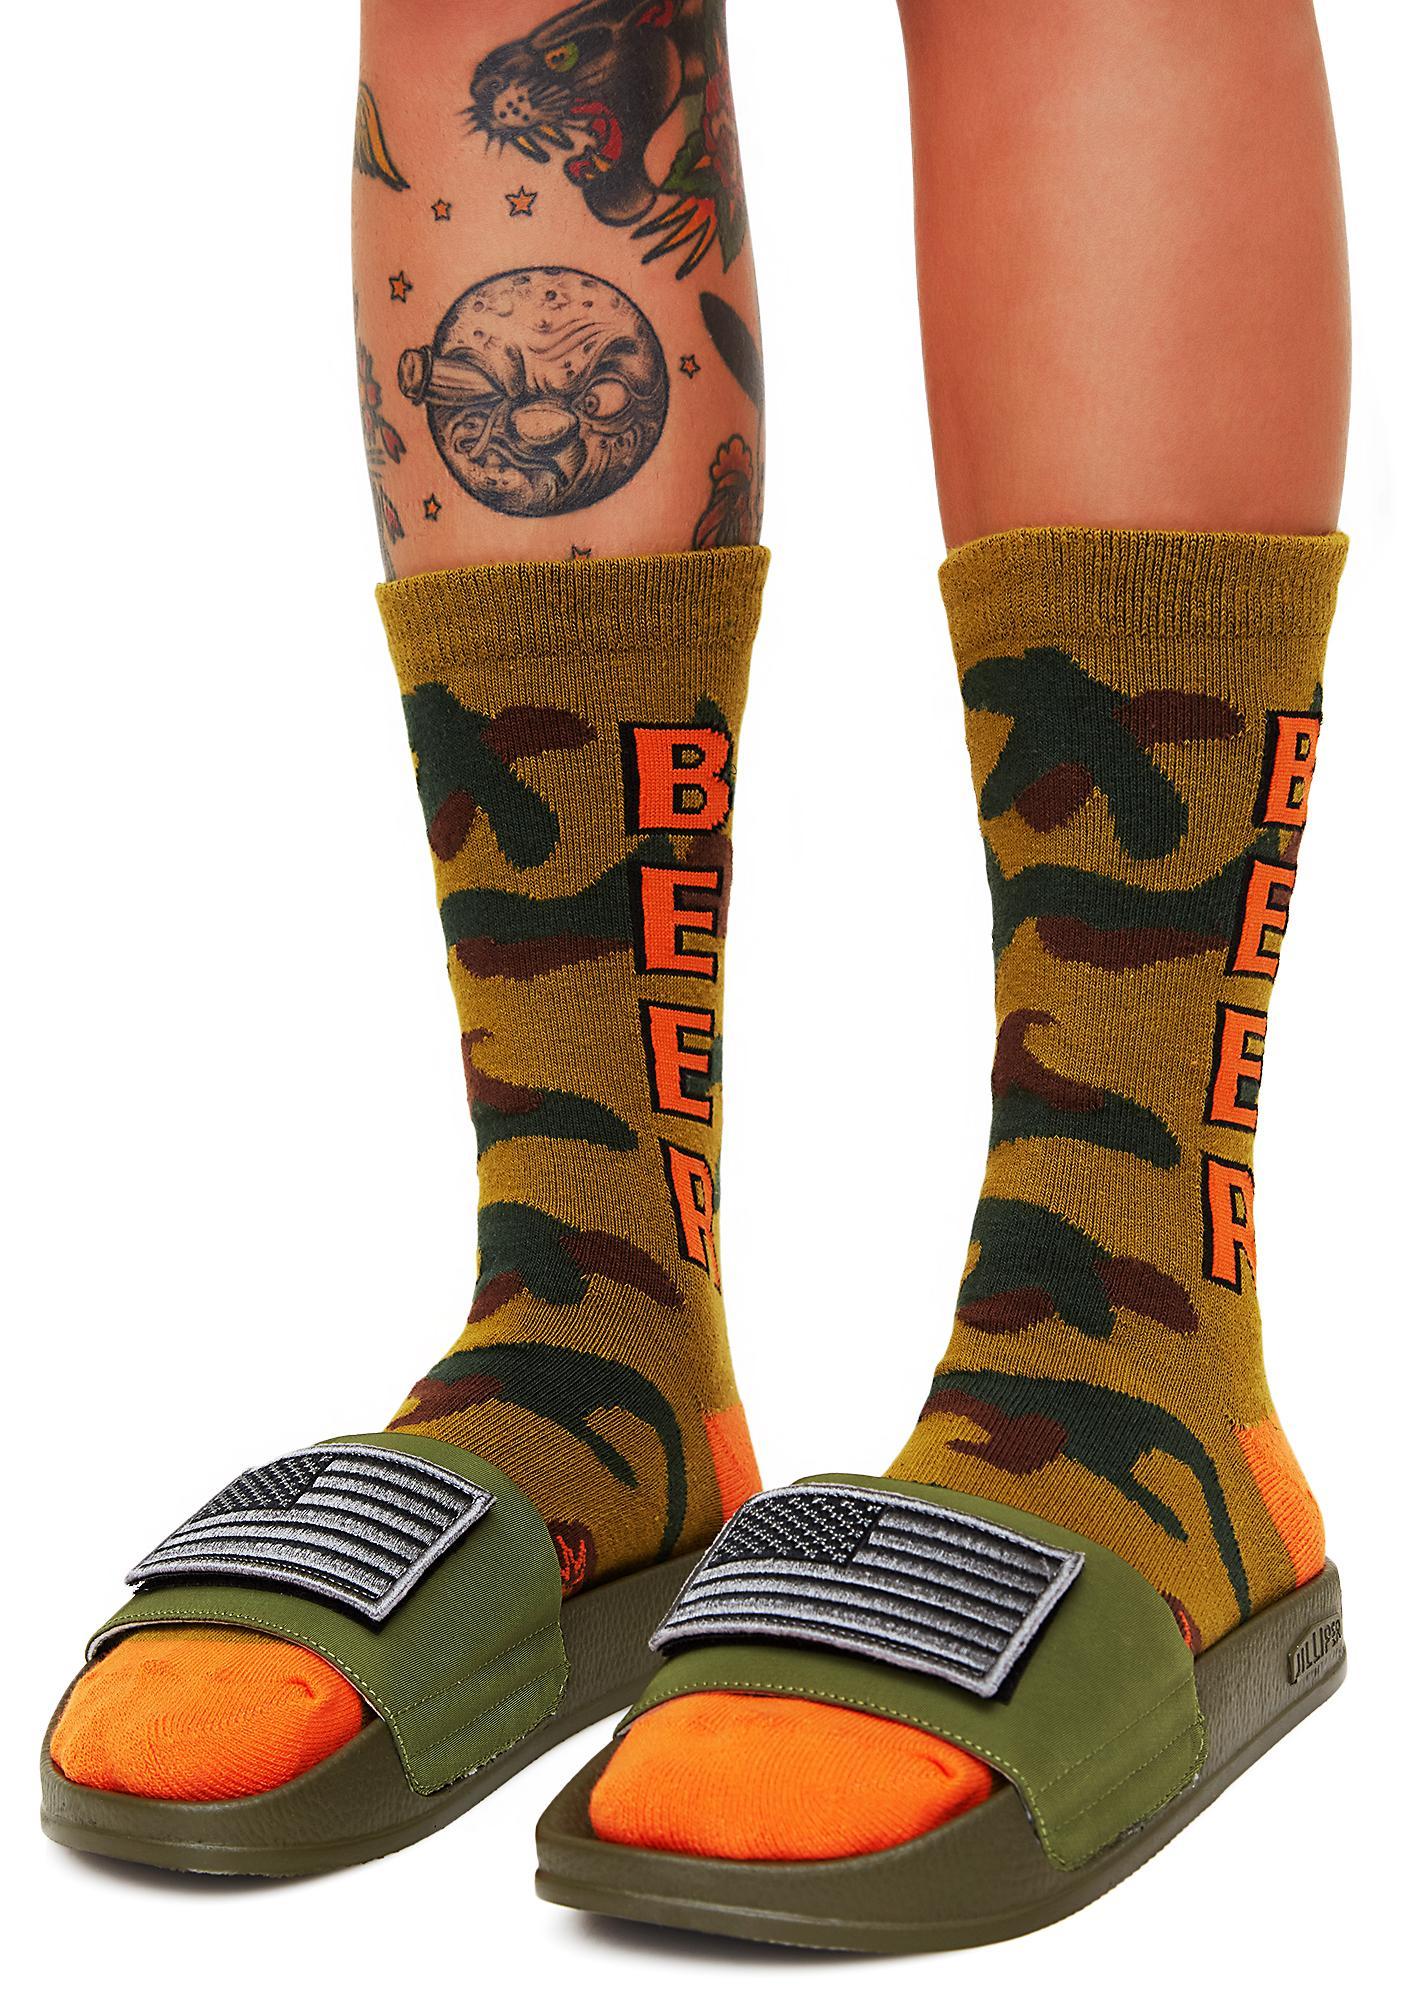 Gumball Poodle Camo Beer Crew Socks